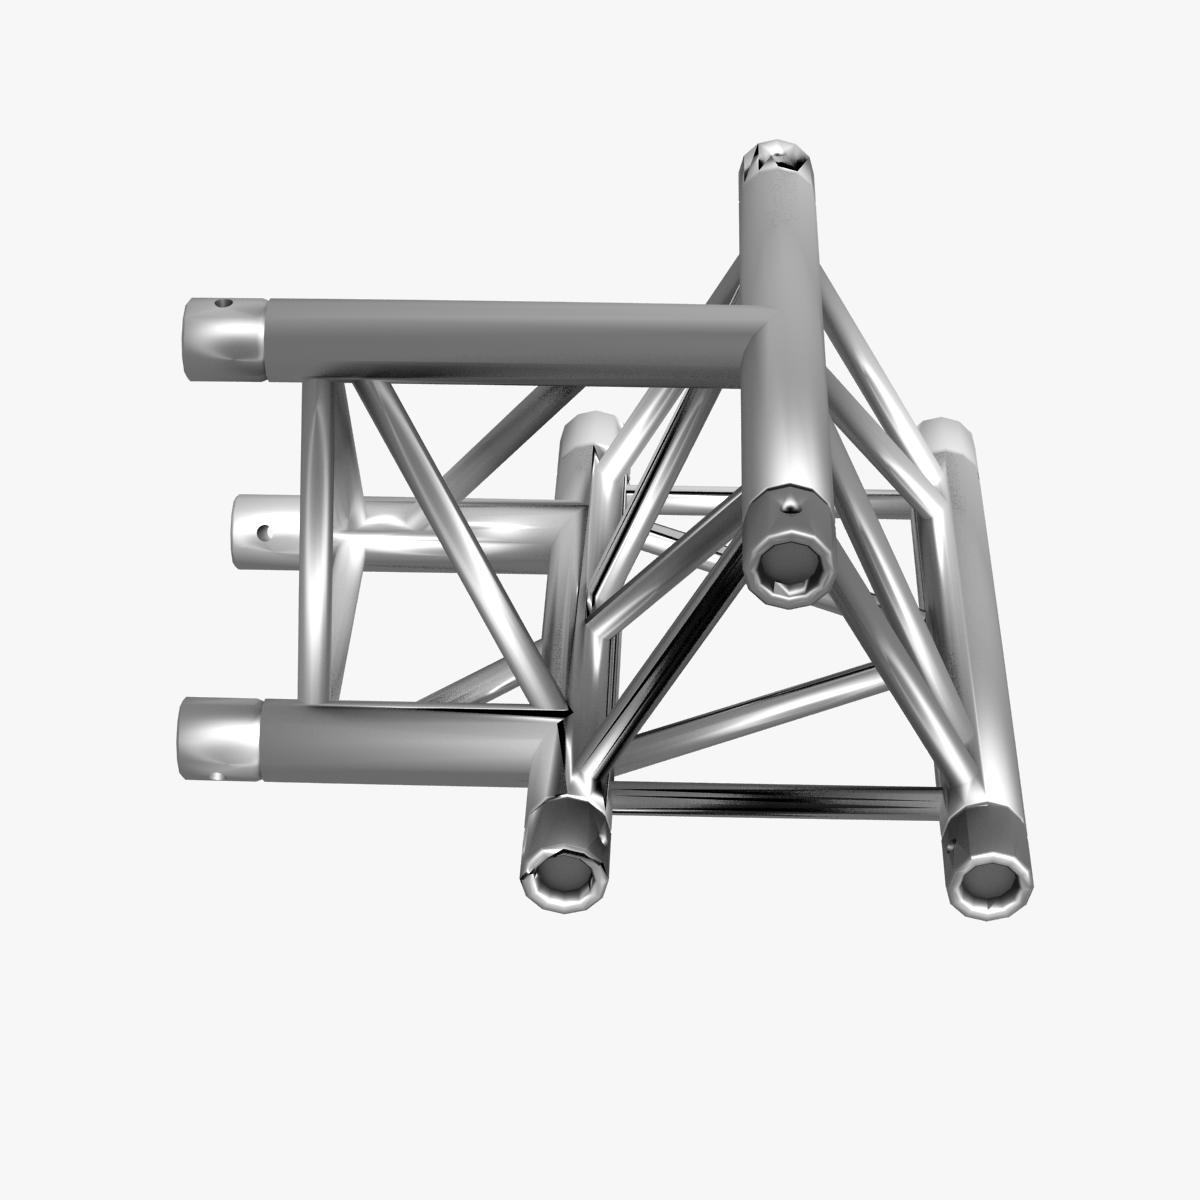 Triangular Truss Cross T Junction 84 3d model 3ds max dxf fbx b3d c4d  obj 268952